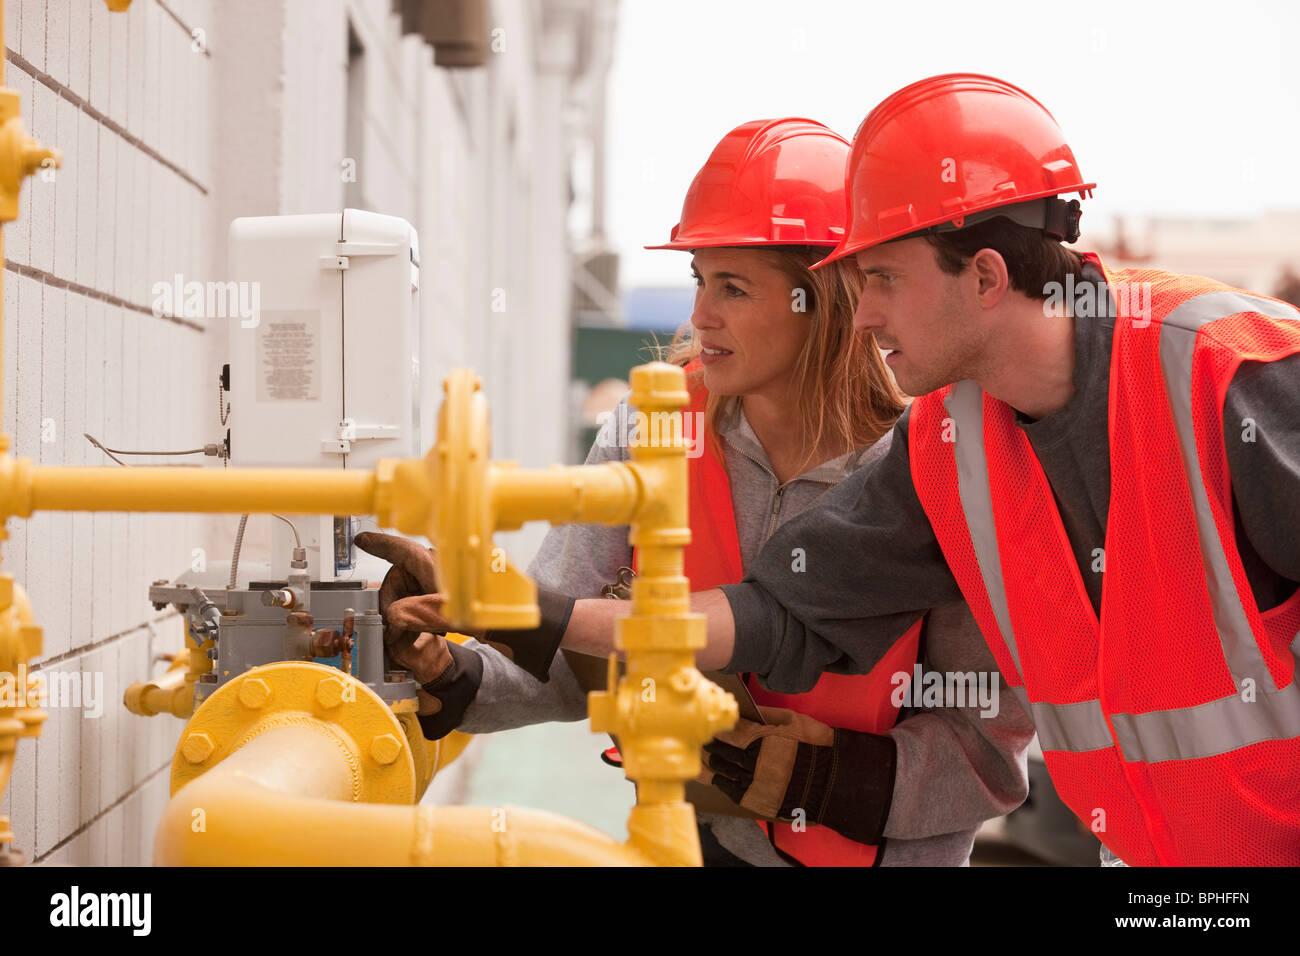 Process engineers taking meter reading near pipeline - Stock Image